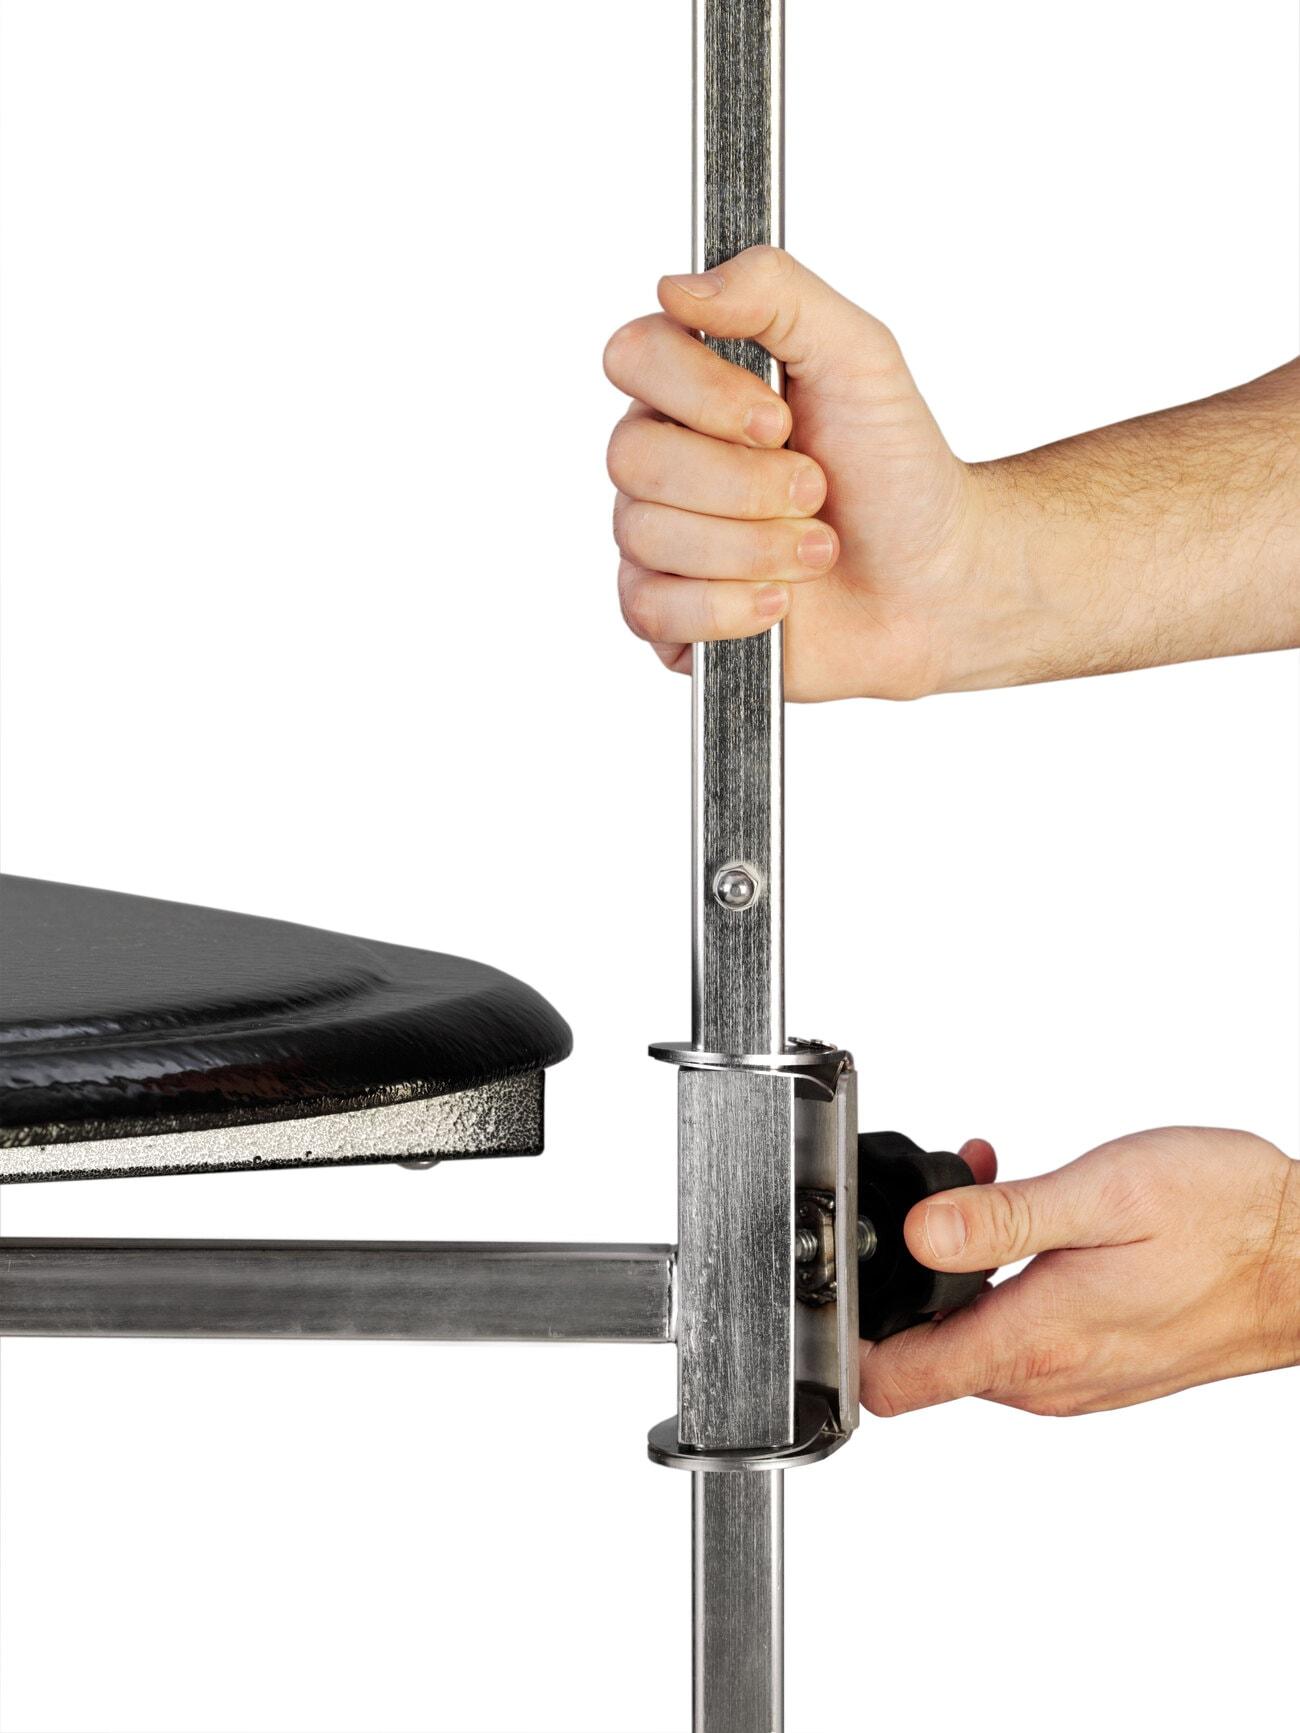 Arm height adjusts 22